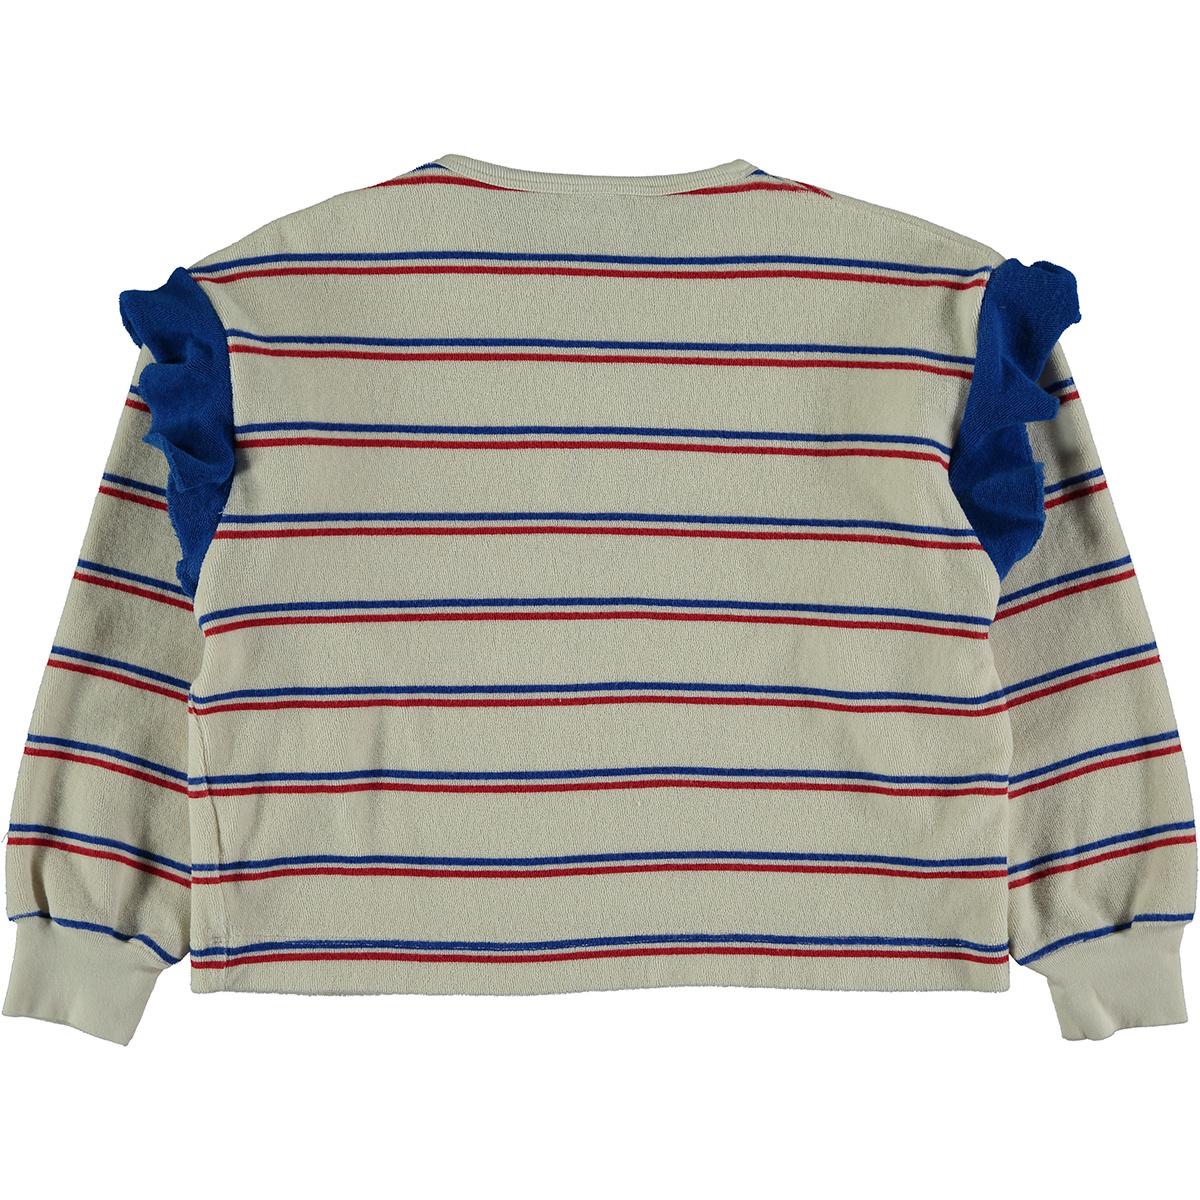 Sweatshirt baby Frill - Ivory-2